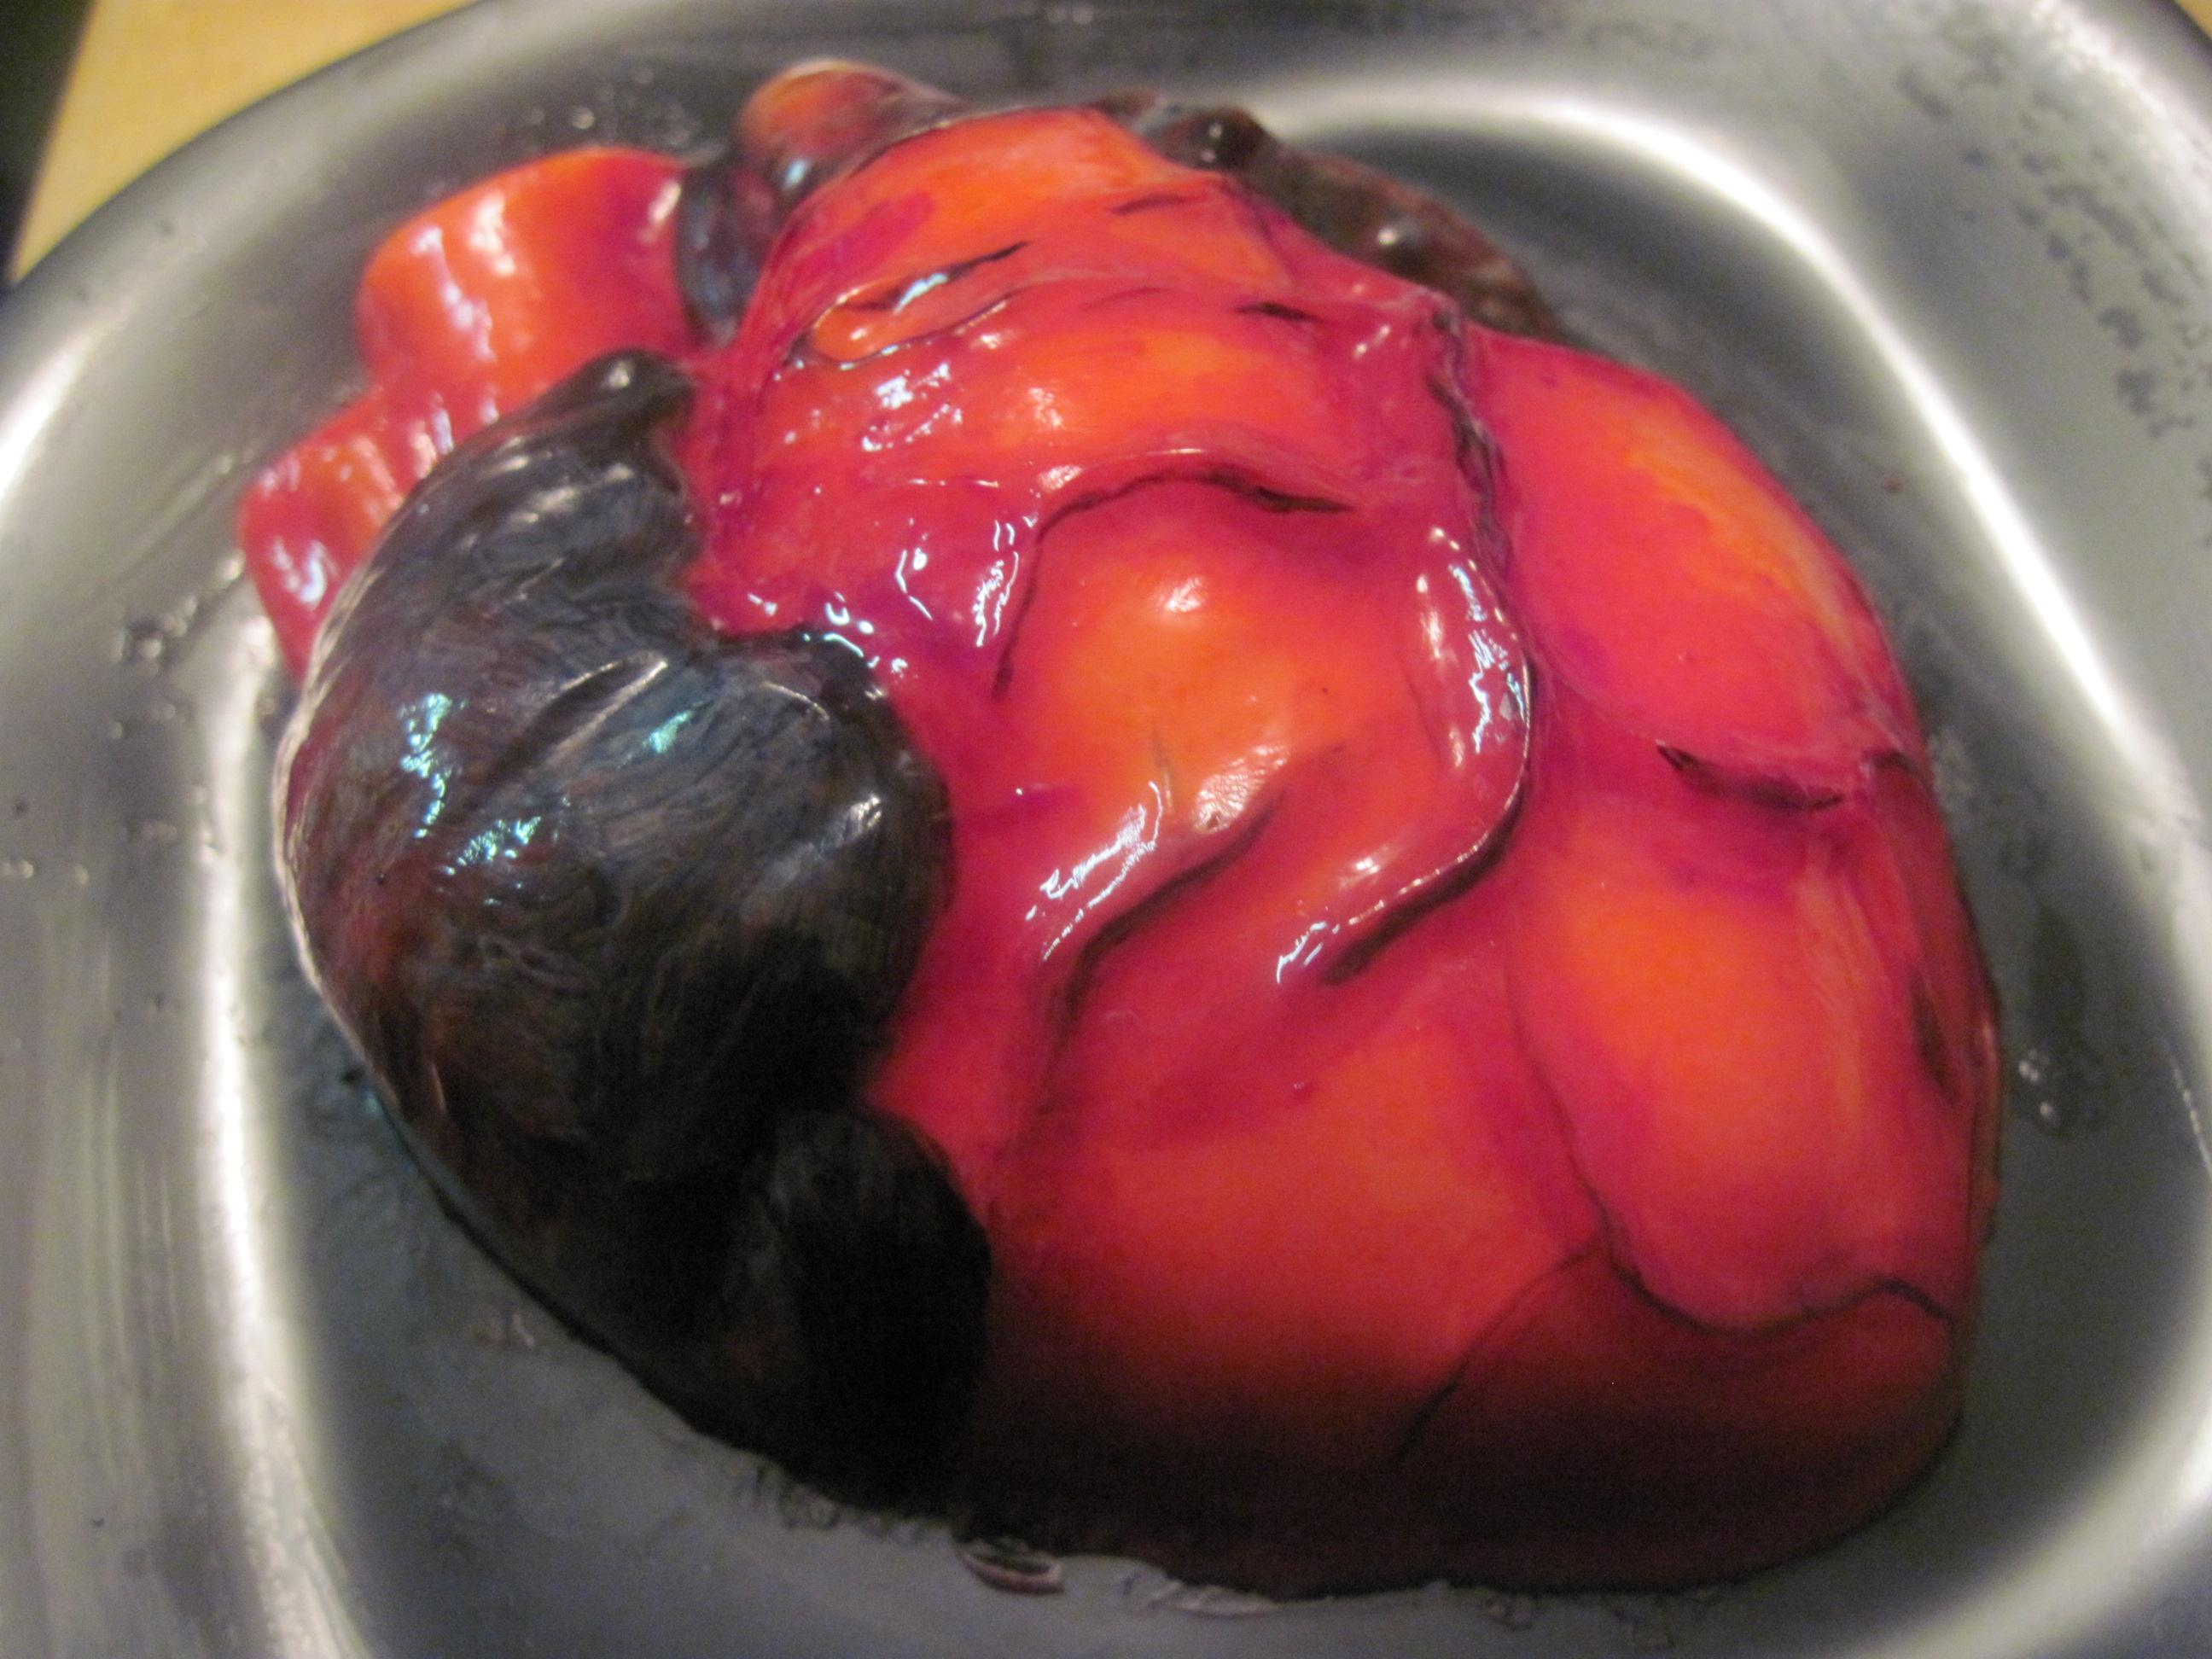 gelating-heart-frightening-foods-010.jpg